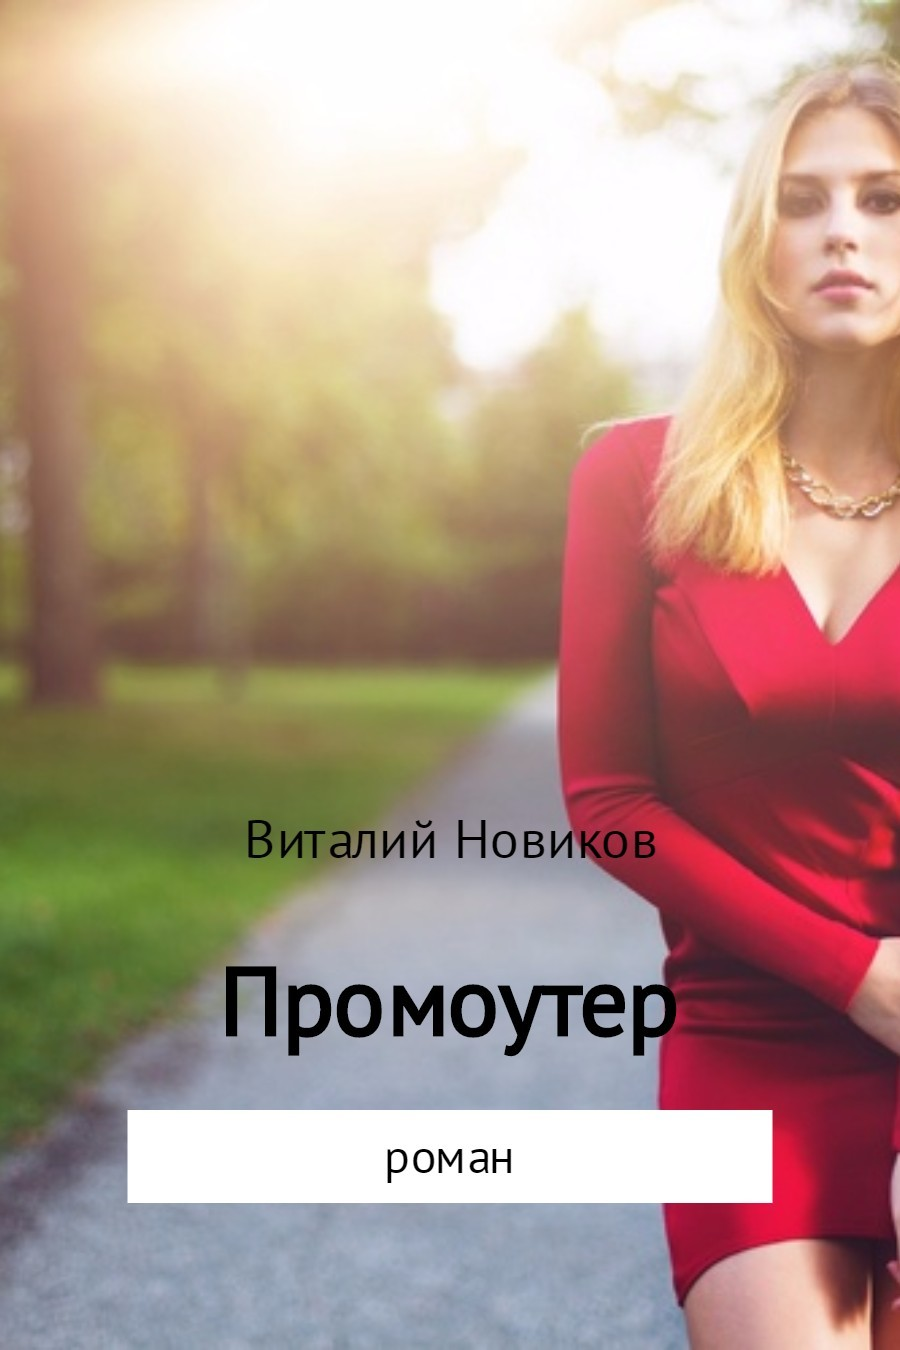 Виталий Новиков Промоутер stylin basecoat в москве